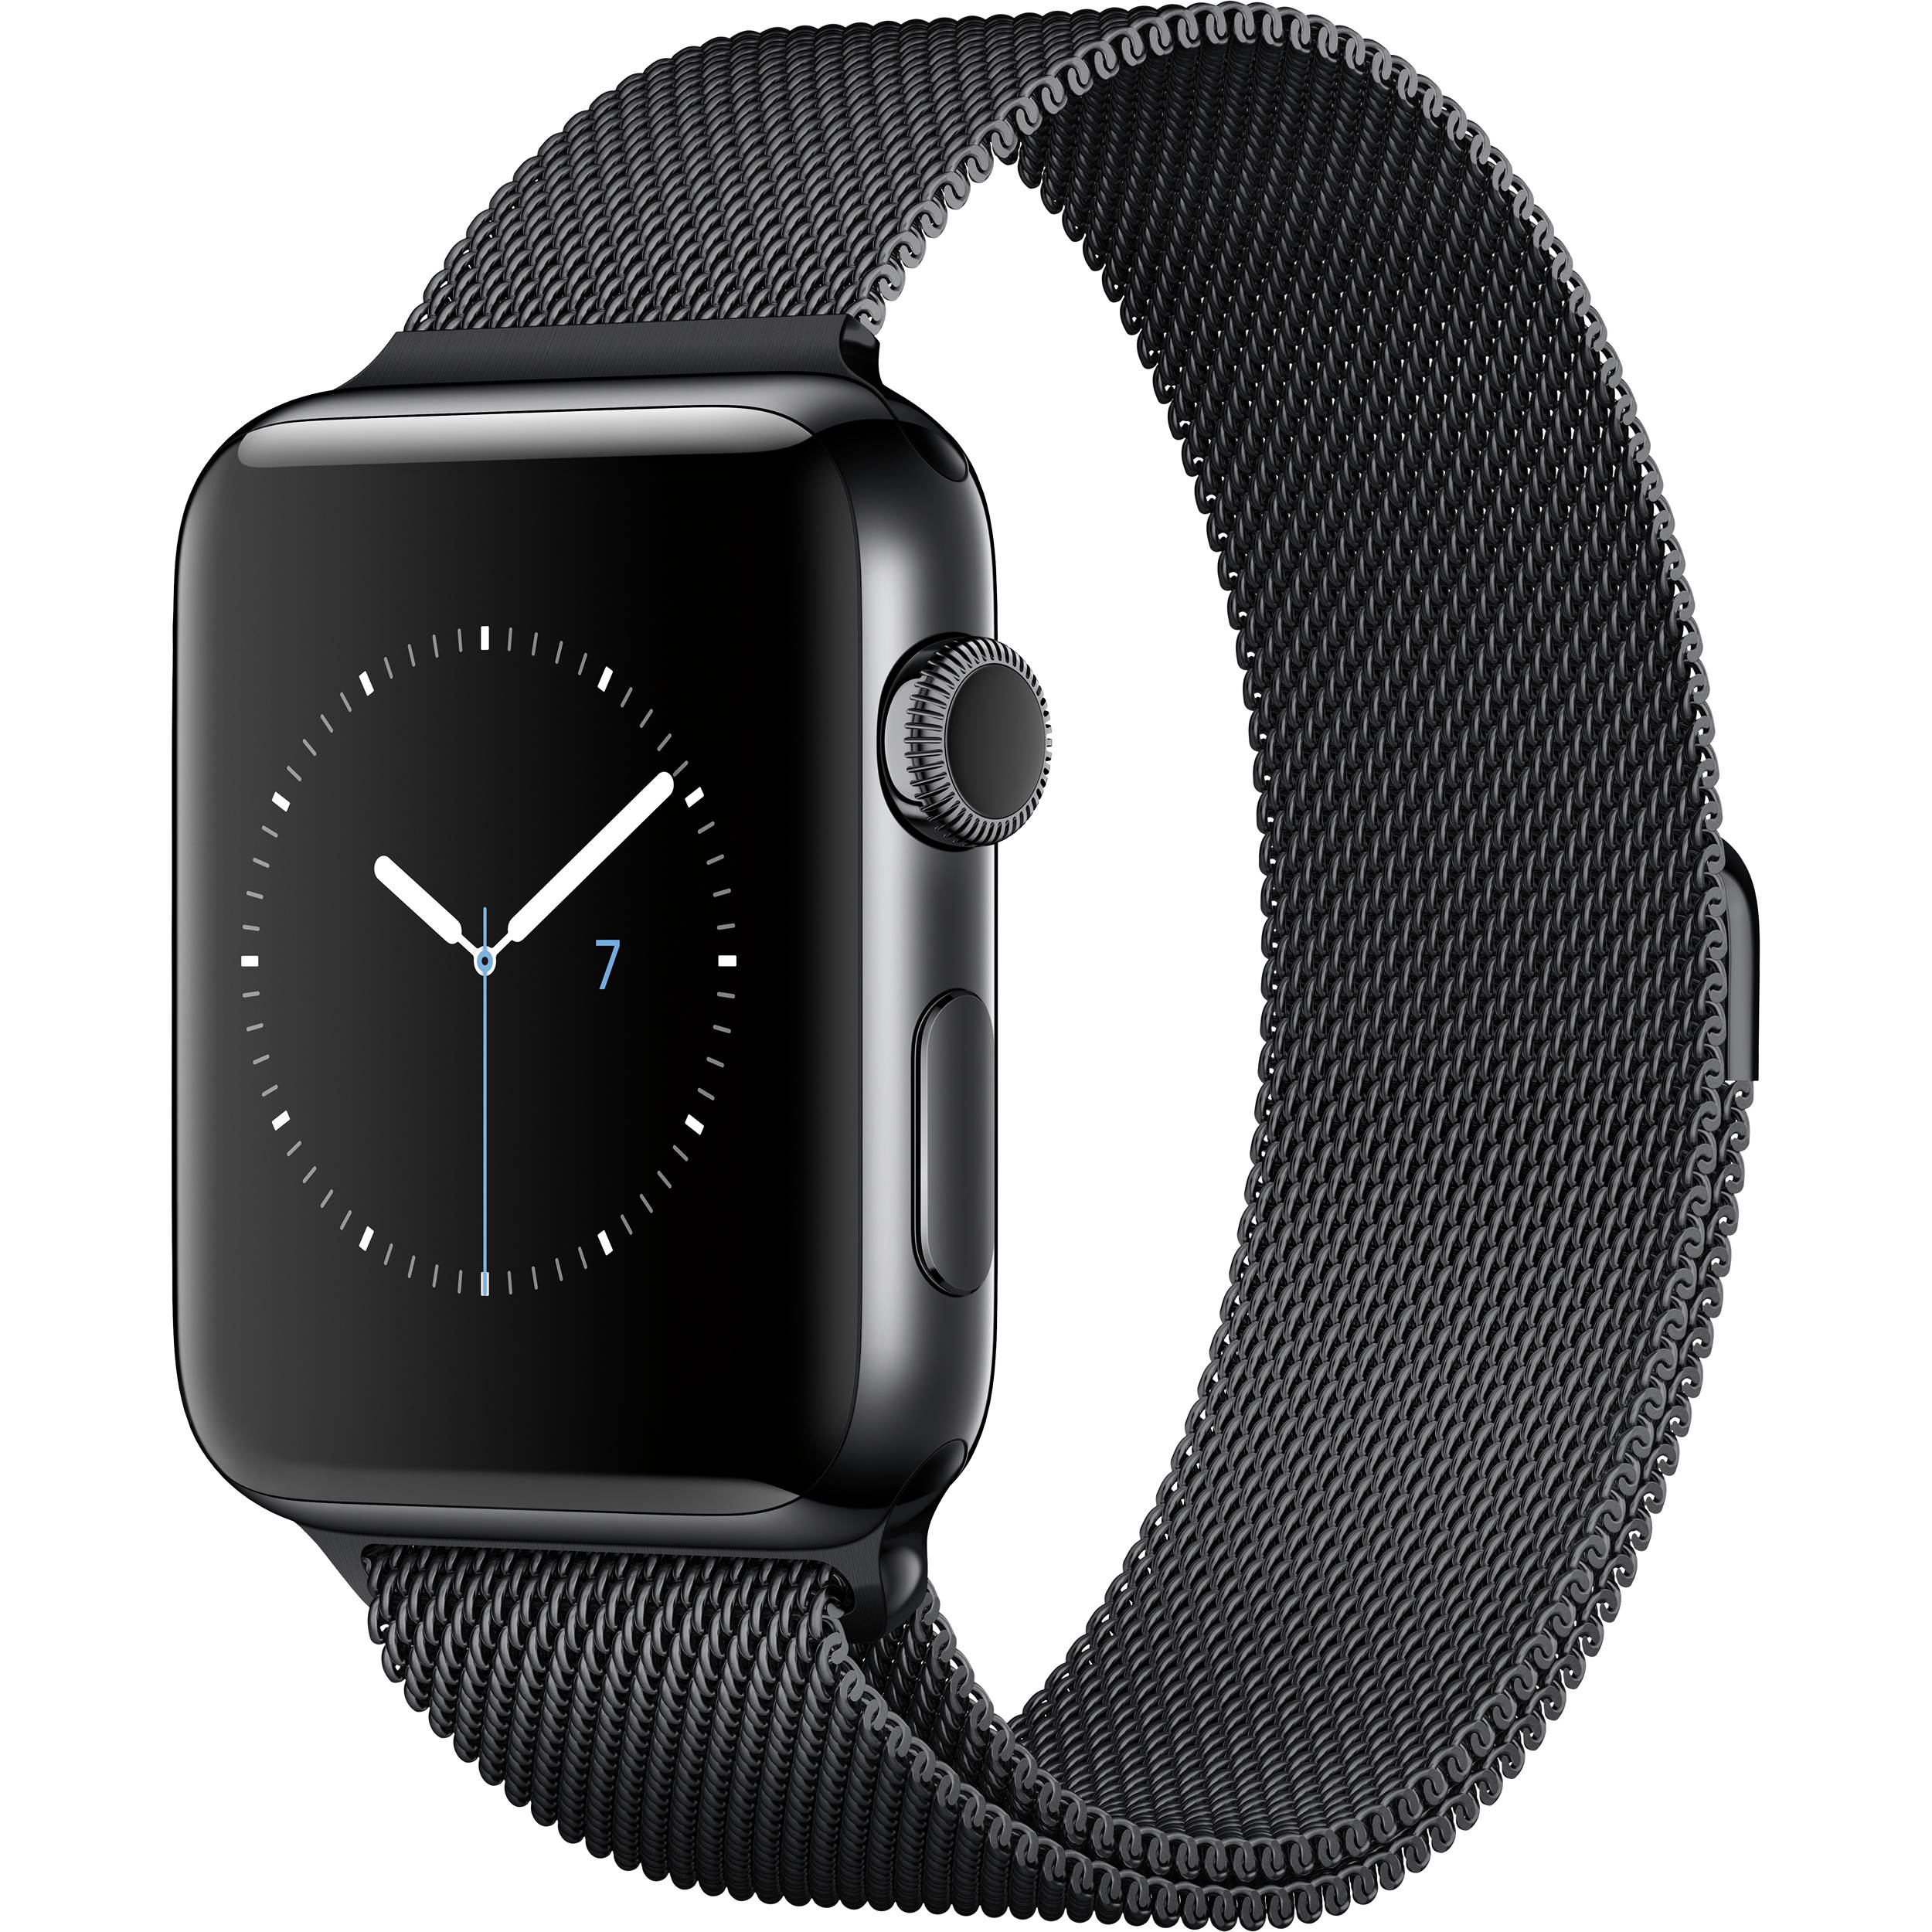 1585042880.302apple Mnq12ll A Apple Watch Series 2 1280625 4 2